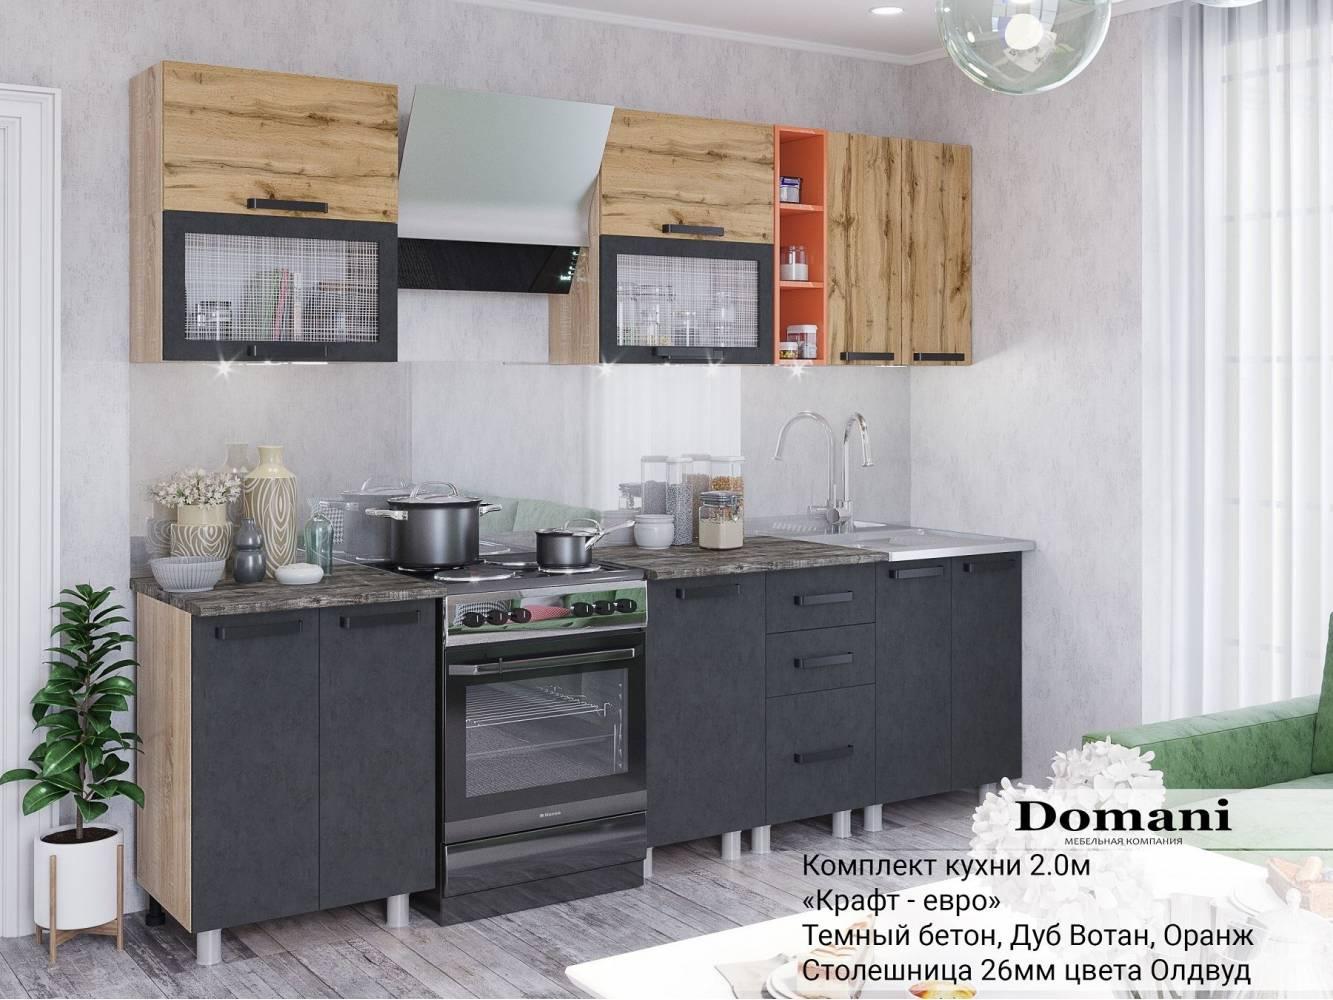 Комплект кухни 2,0 м Крафт-евро Темный бетон, Дуб Вотан, Оранж